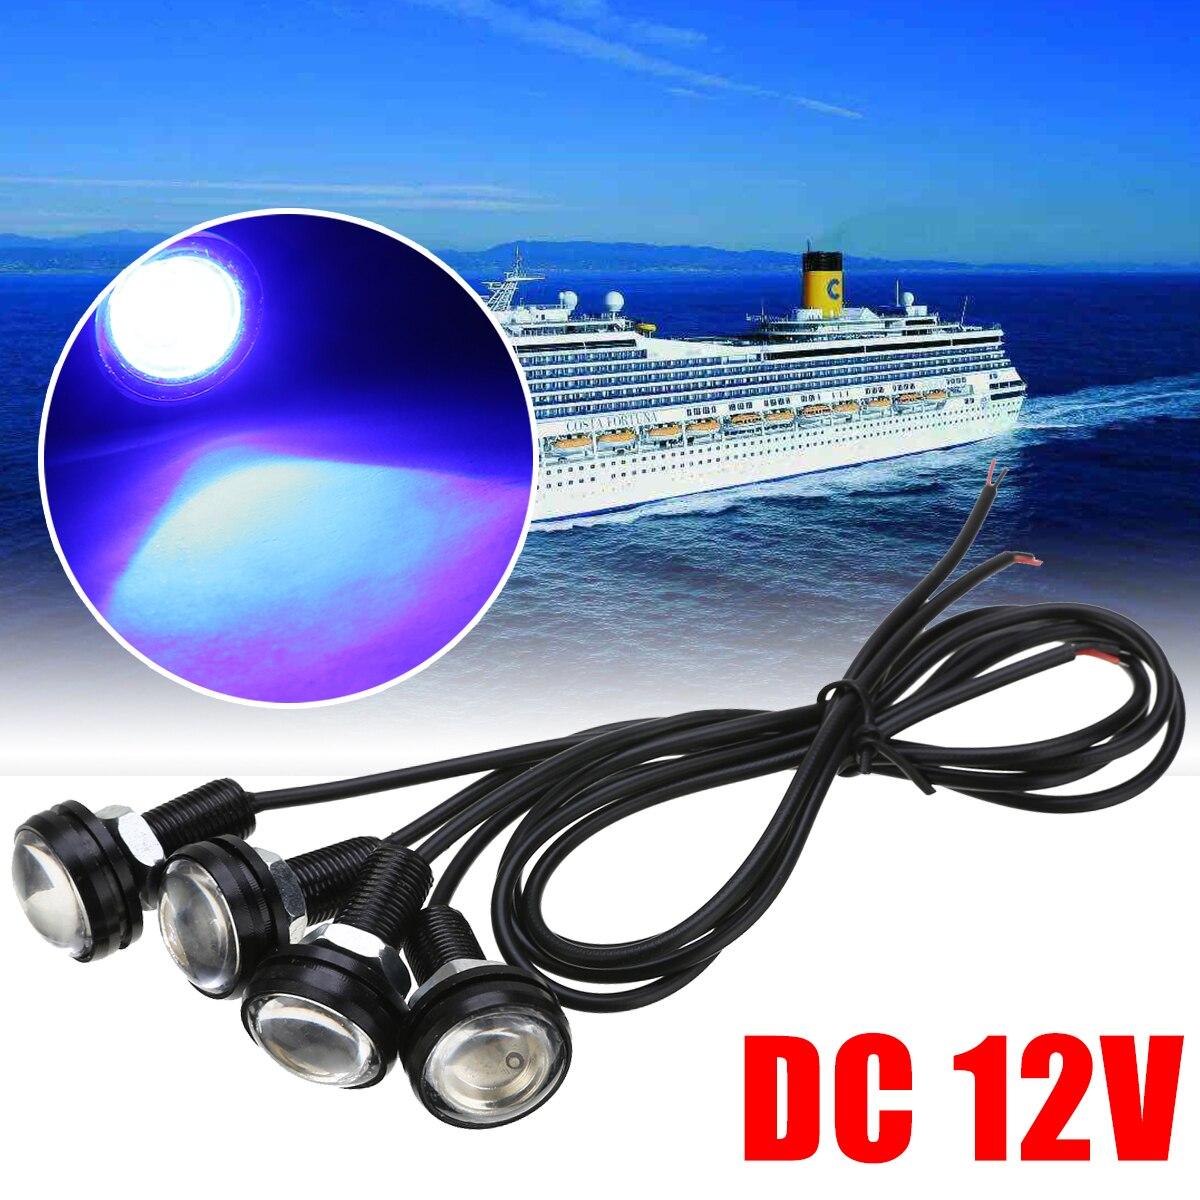 New Arrival 4pcs Set Blue LED Boat Eagle Eye Light Waterproof Outrigger Spreader Transom Underwater Corner Signal Lamp